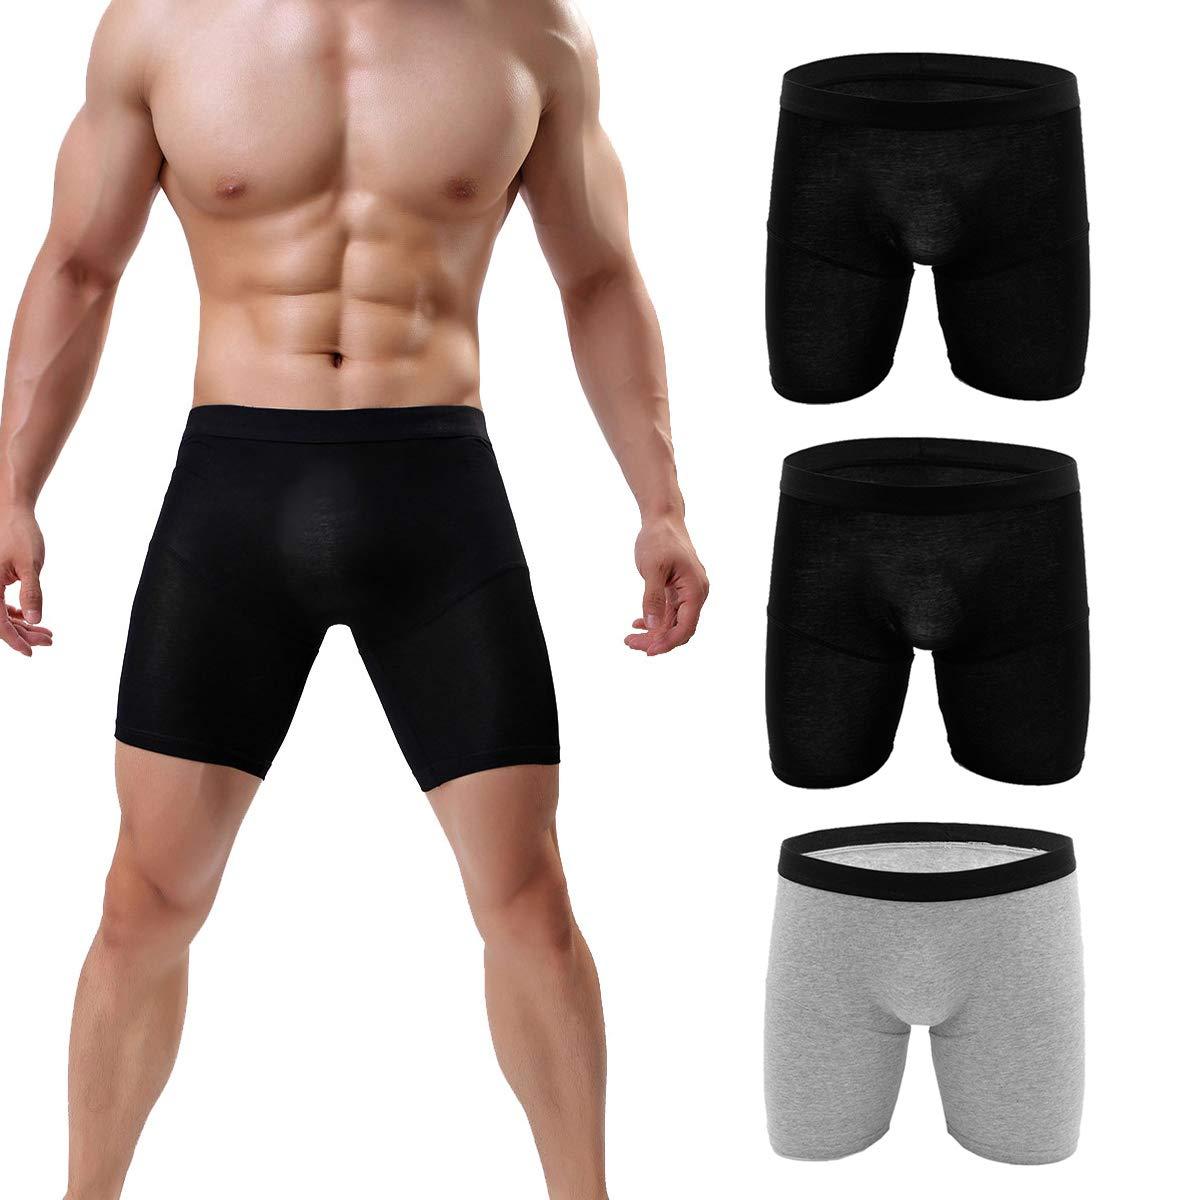 cd4b1f05b7a7 NANBADUN 3-Pack Men's Boxer Briefs Cotton Underwear Boxer Briefs Long-Sleeve  Briefs Smooth Breathable Antibacterial Deodorant (XXL Waist 33 inch, ...